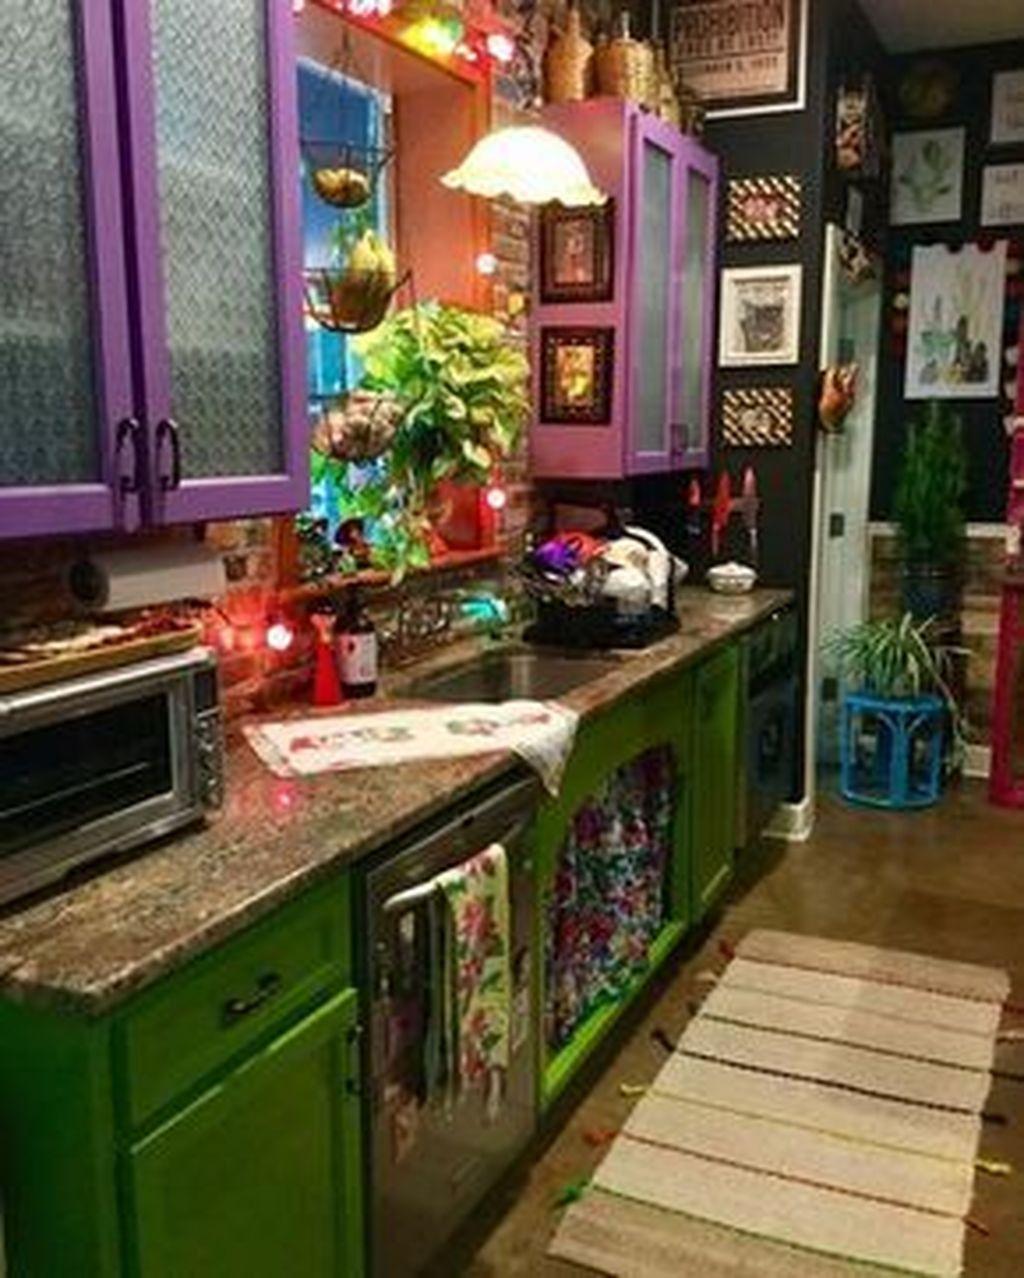 20 fascinating bohemian kitchen decorating ideas bohemian kitchen boho kitchen decor on kitchen decor hippie id=17519